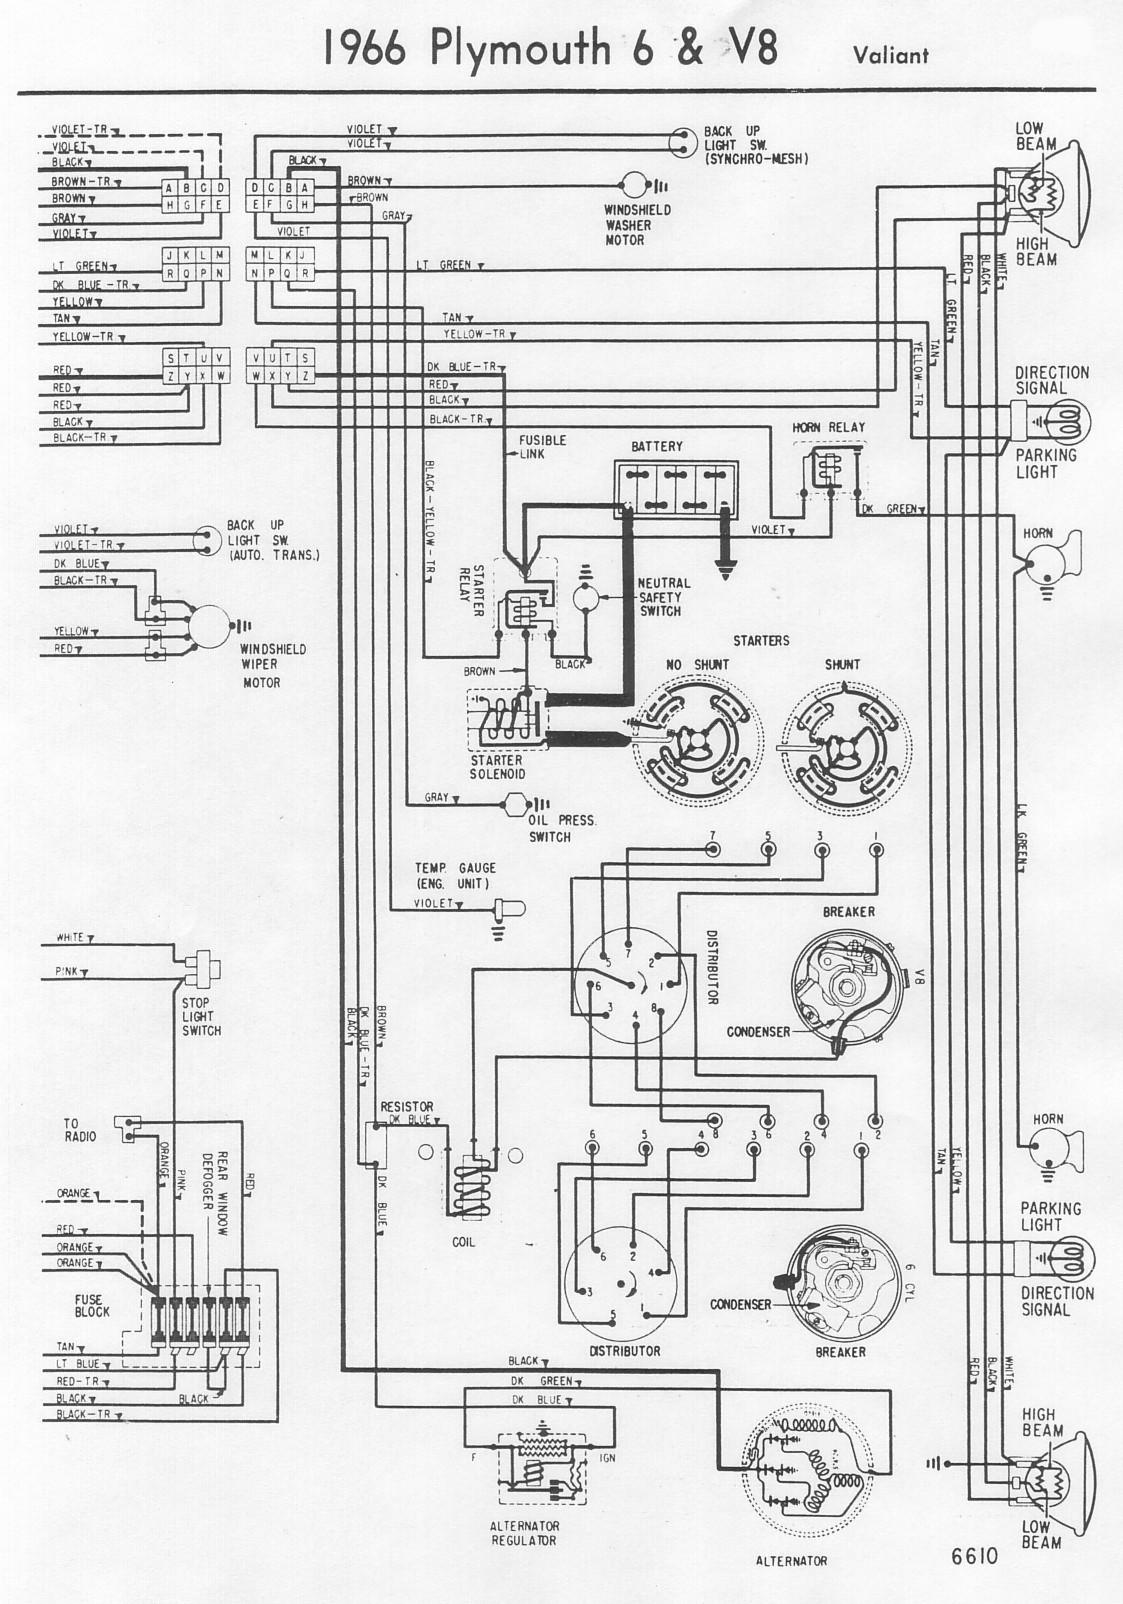 Wondrous 1941 Cadillac Wiring Diagram Basic Electronics Wiring Diagram Wiring Cloud Icalpermsplehendilmohammedshrineorg